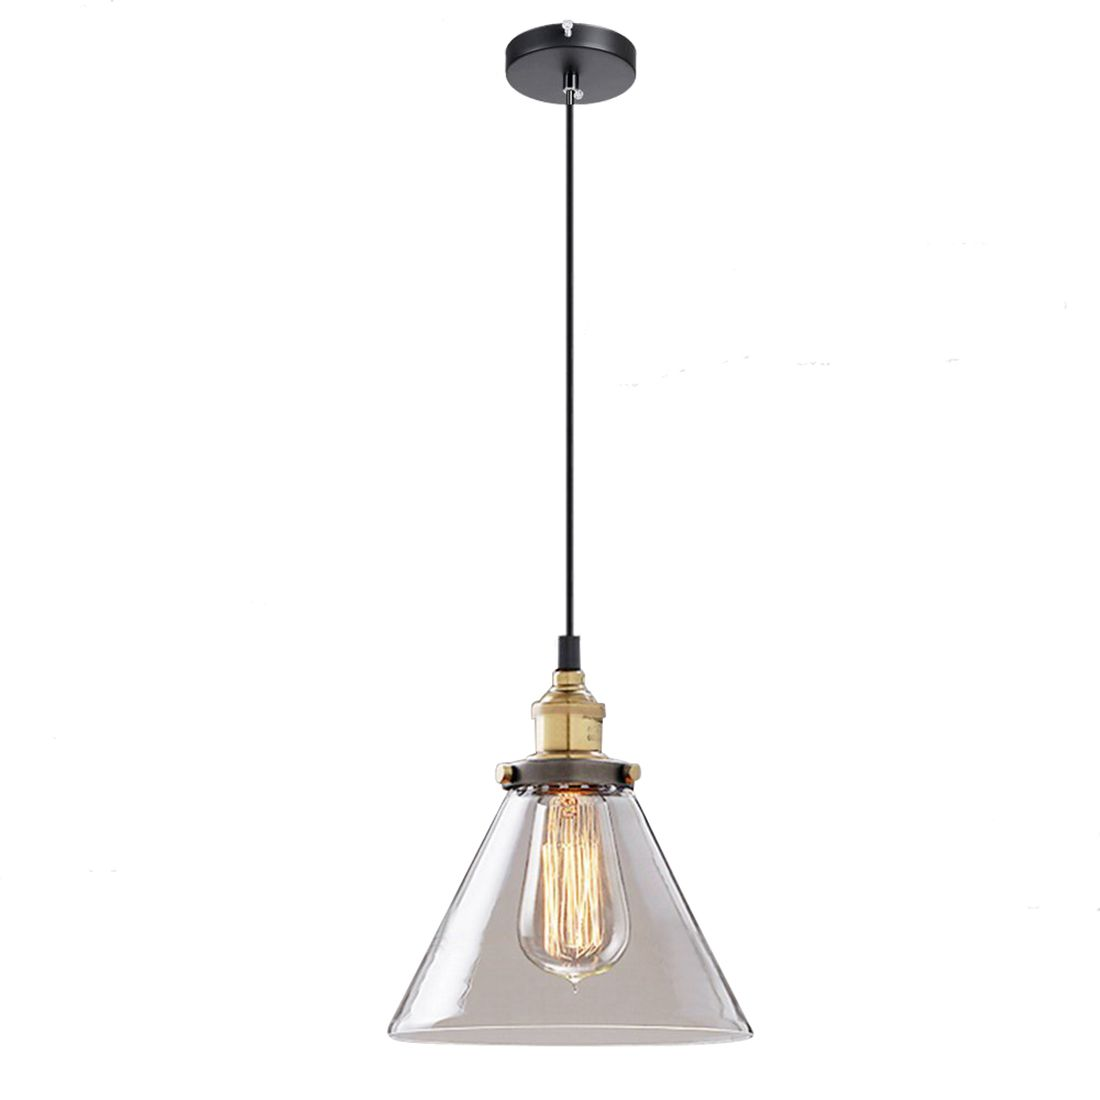 8.7 Clear Glass Fixture Vintage Industrial Pendant Lamp Fixture Hanging Light (diameter 18cm)<br>